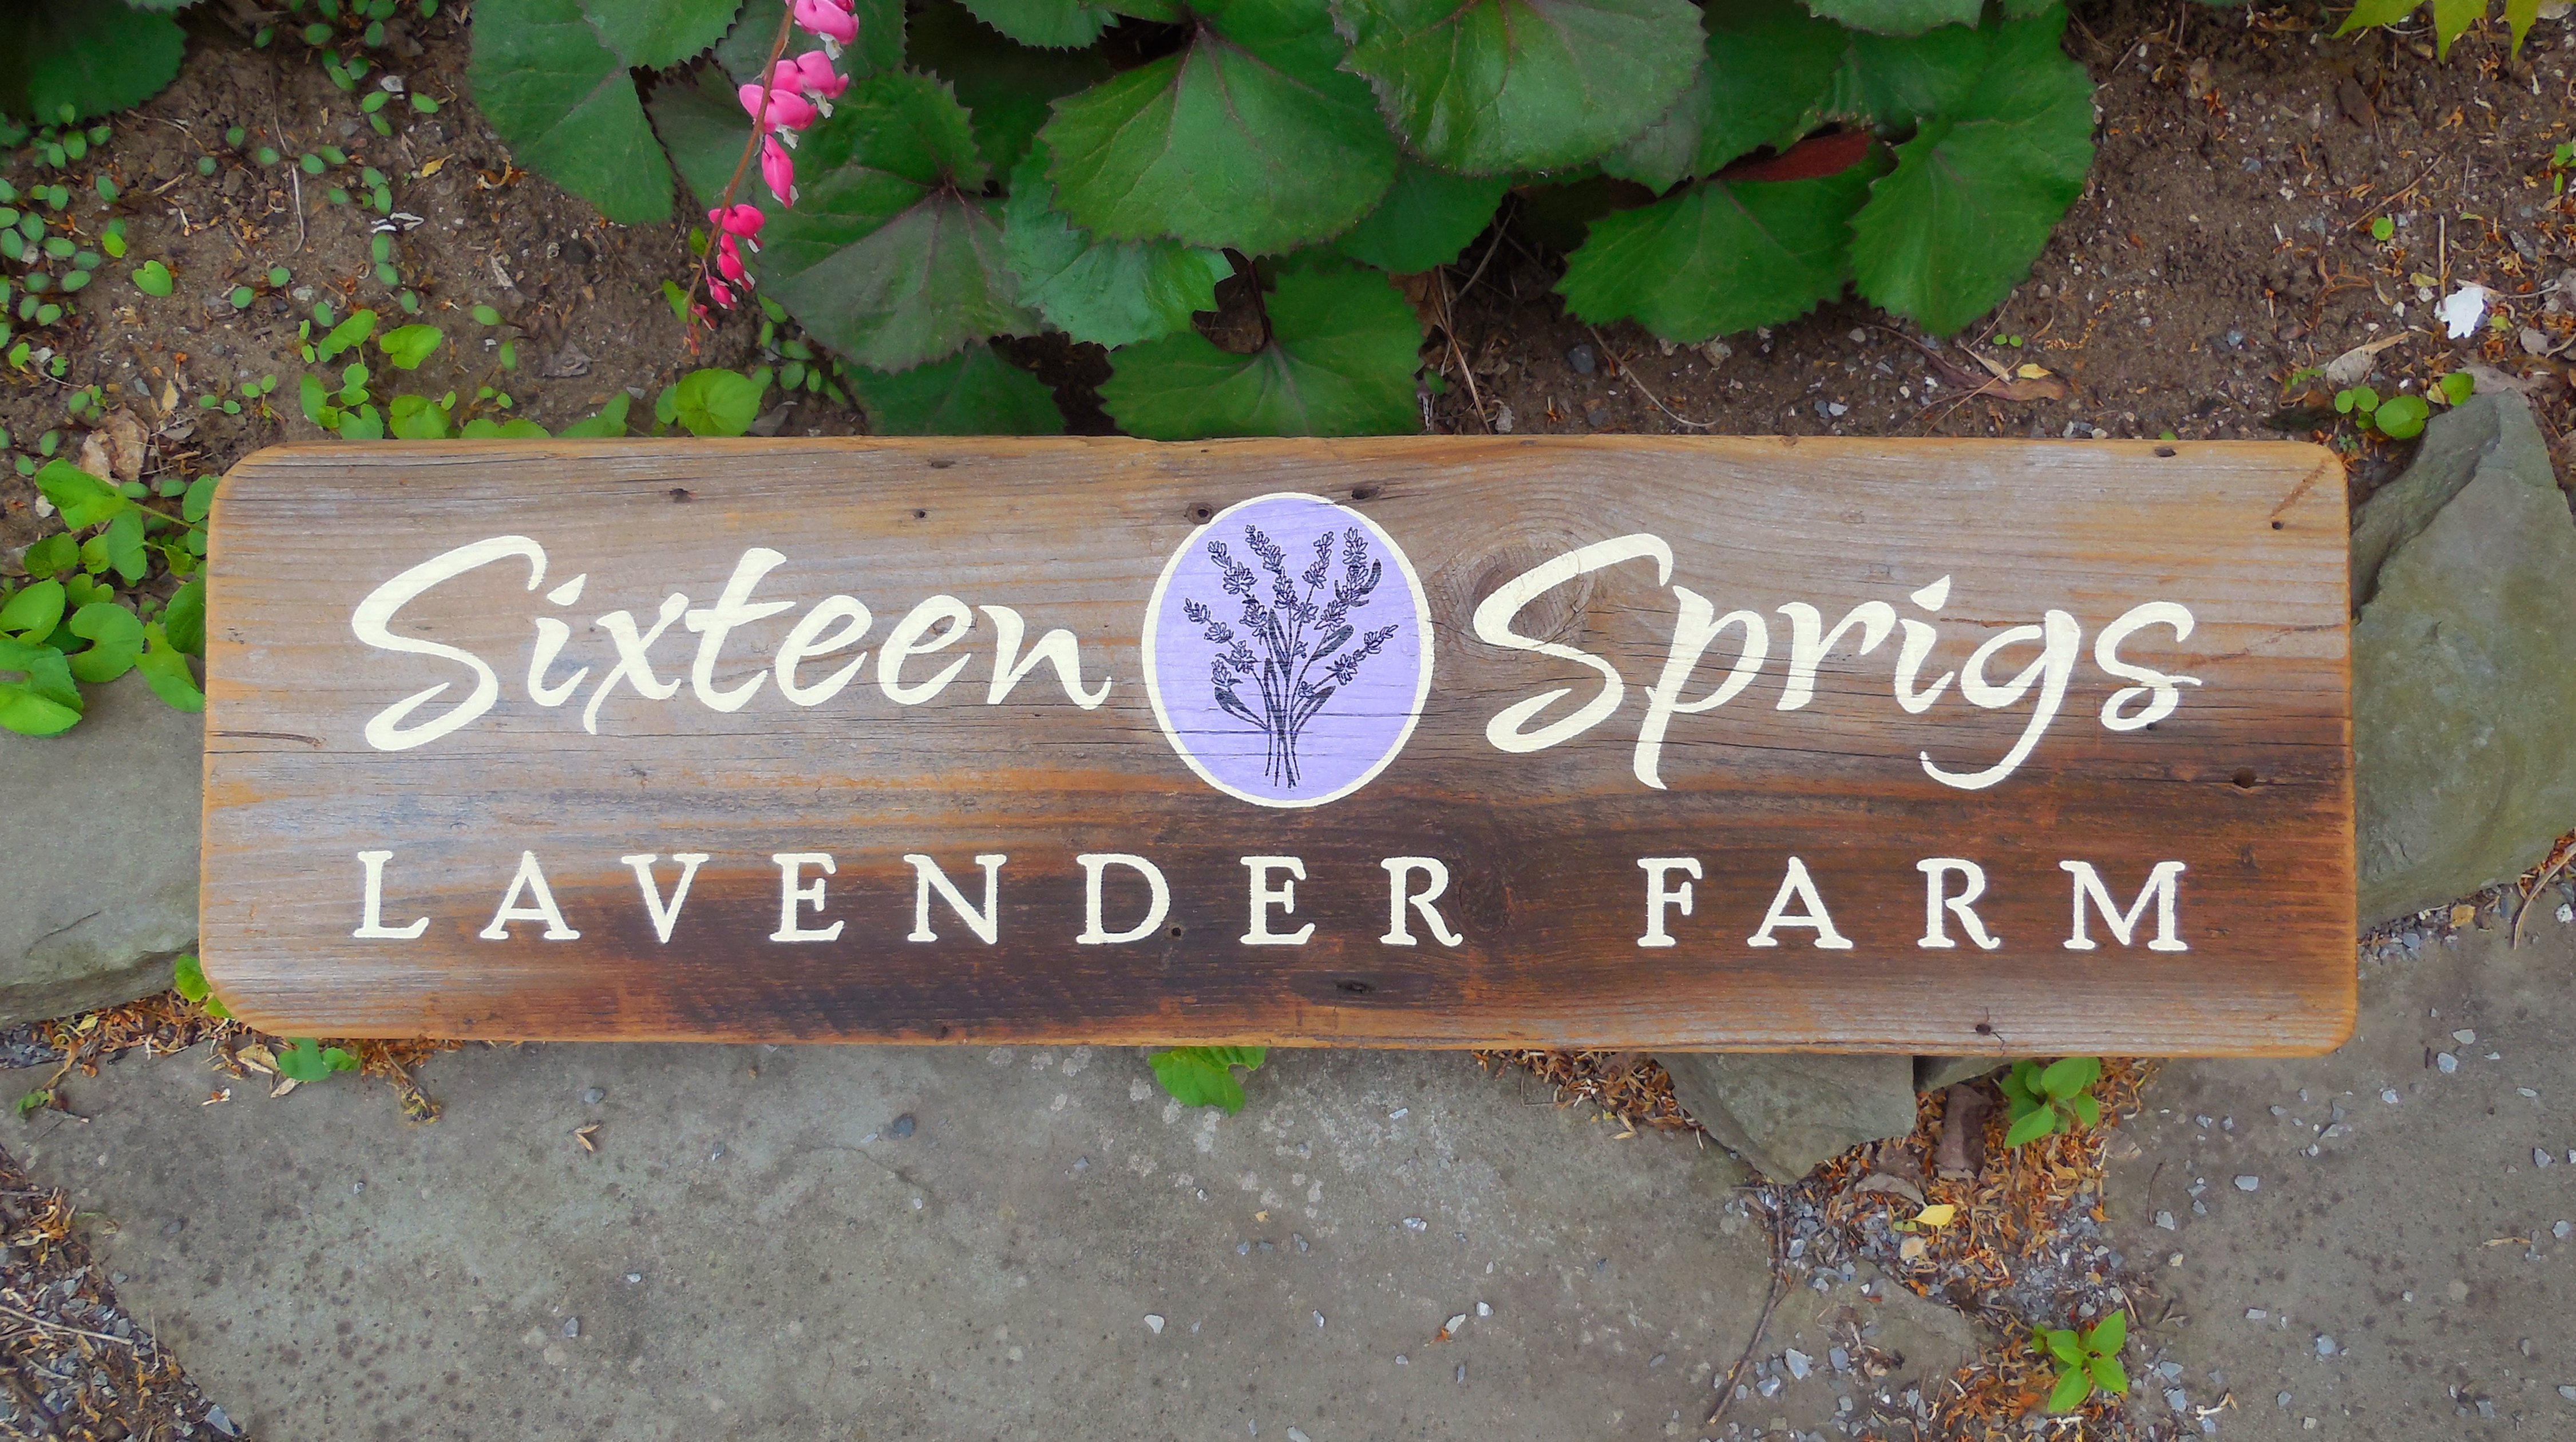 Farm_SixteenSprigsLavender